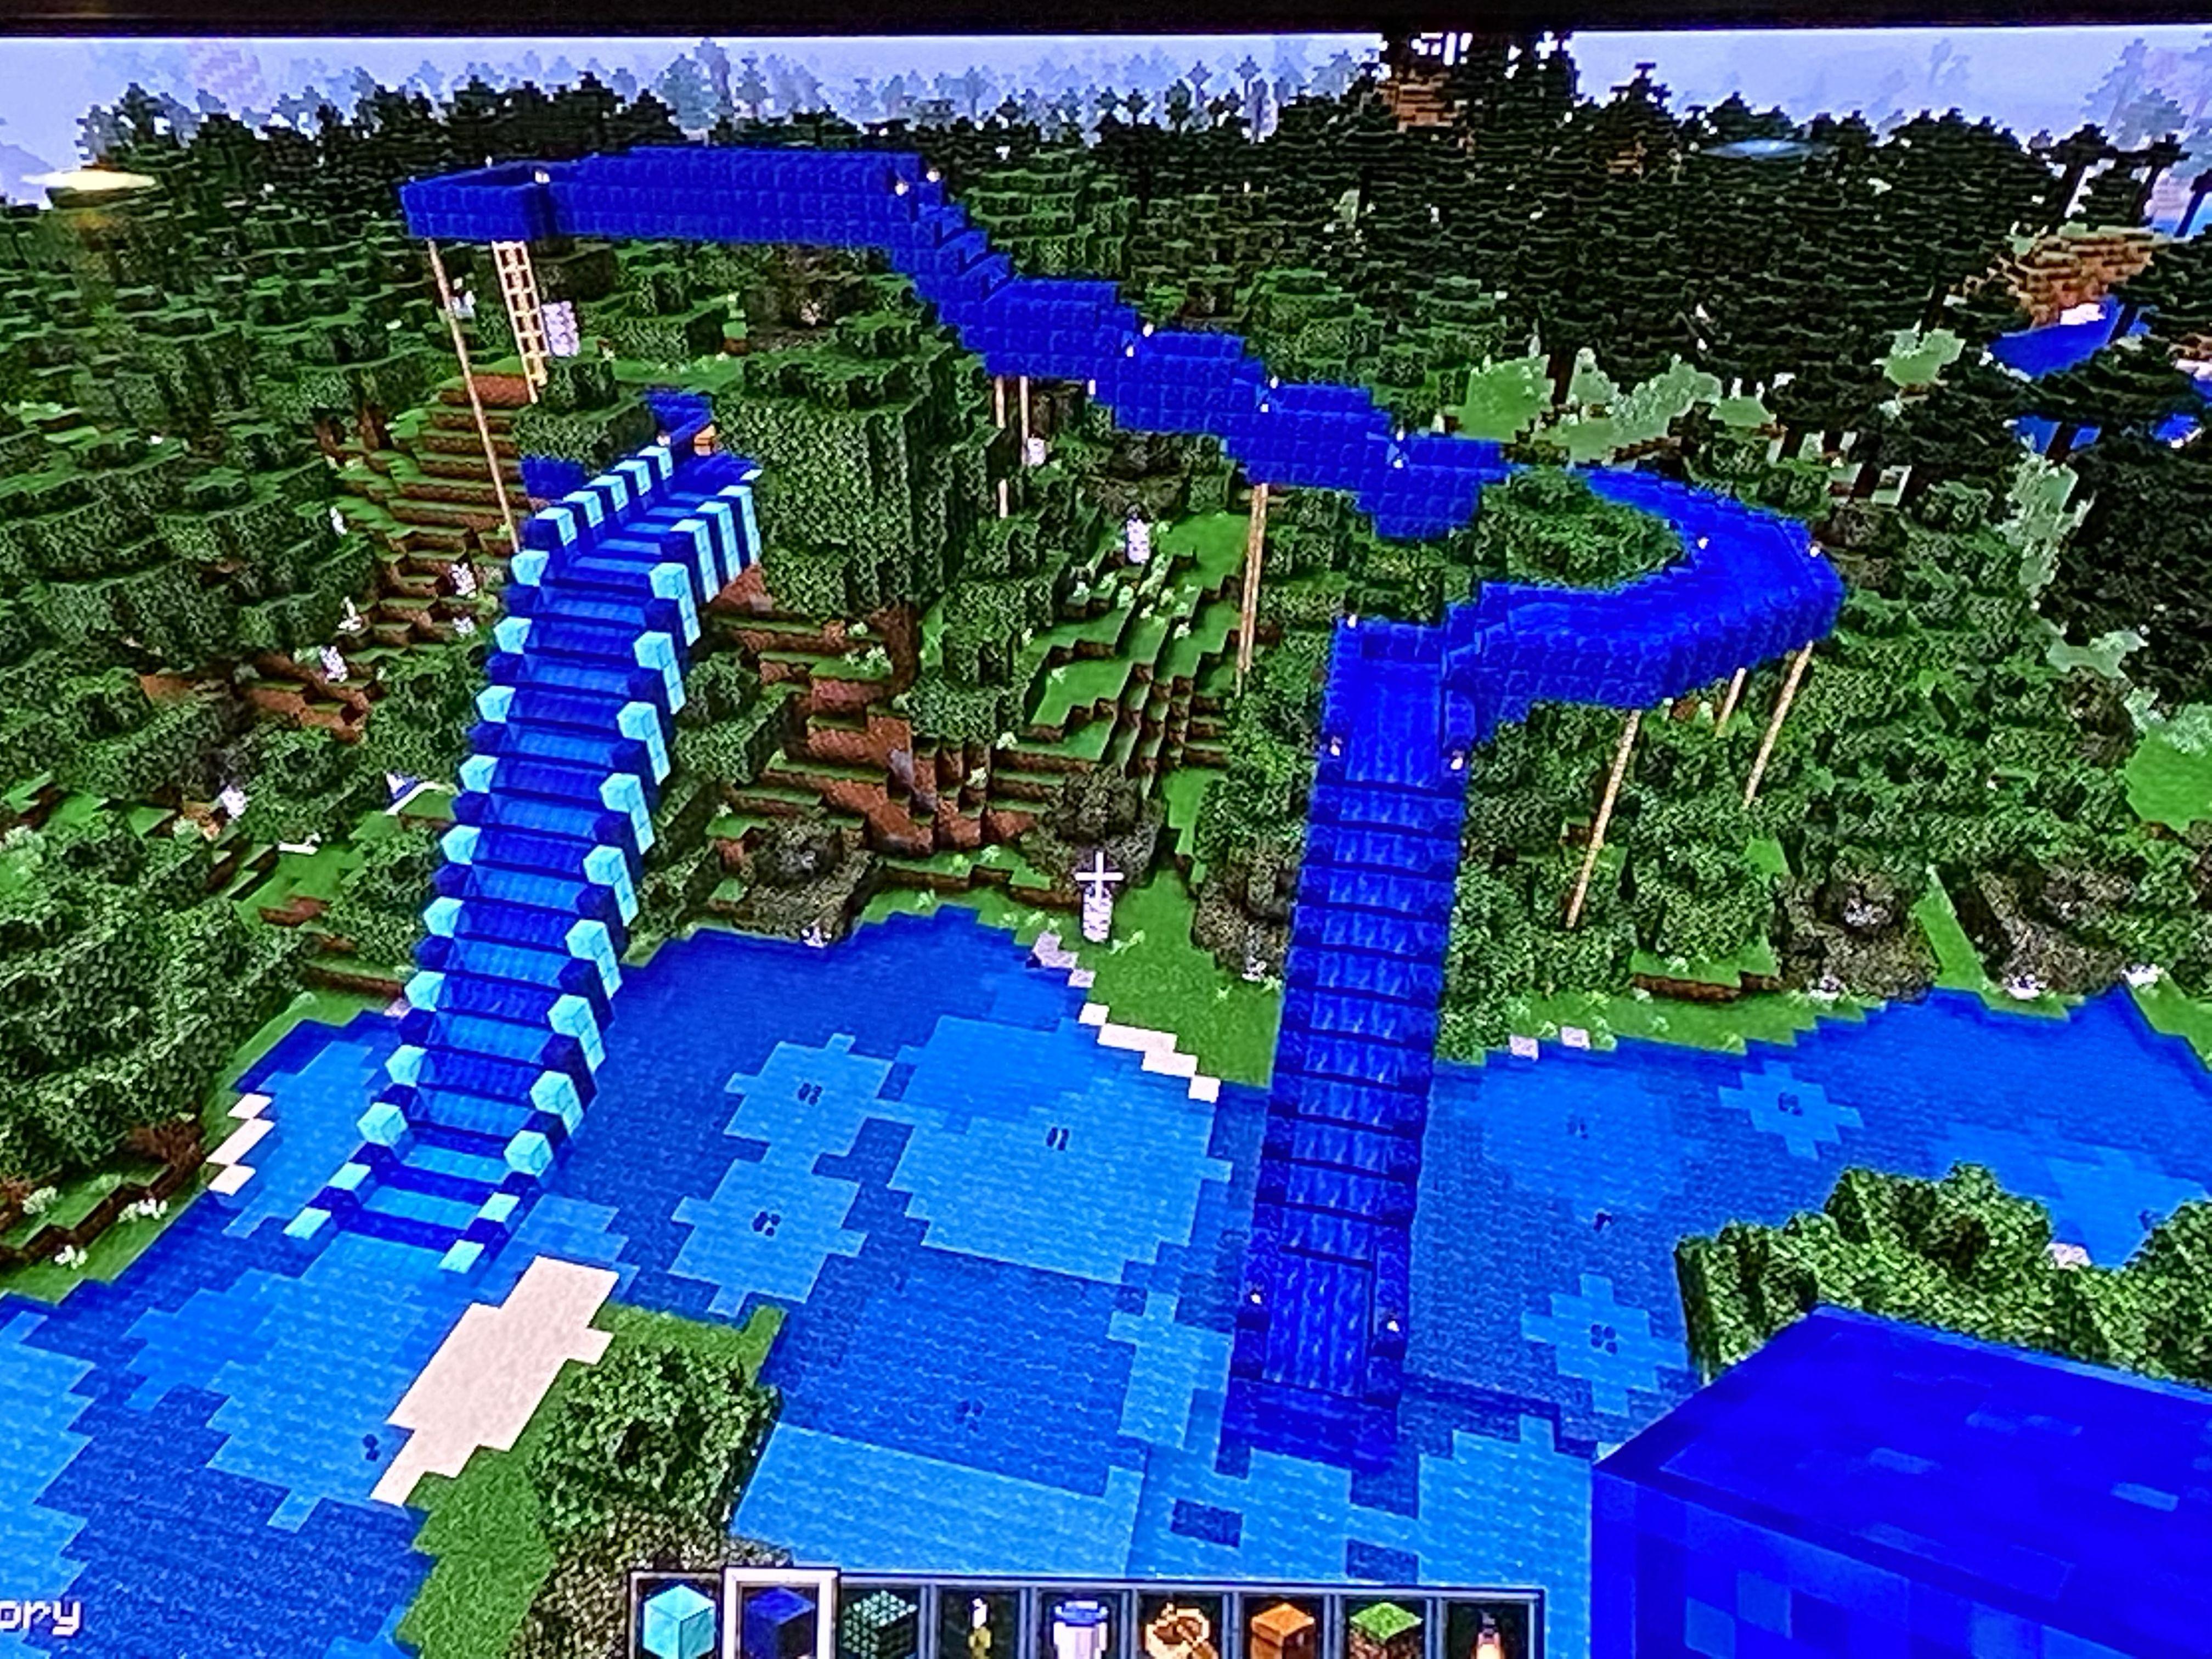 29+ Minecraft theme park ideas ideas